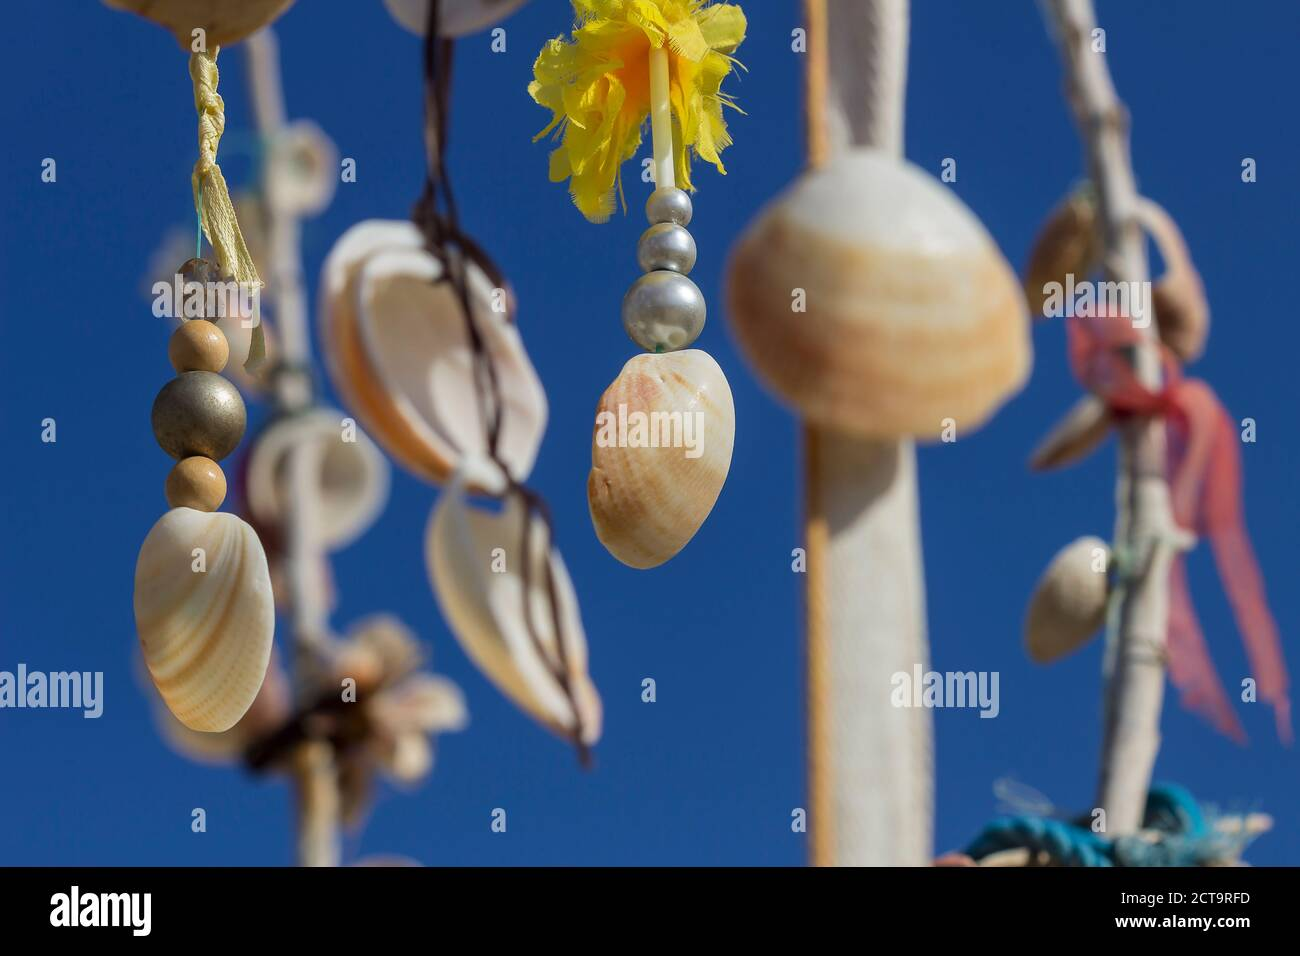 España, Islas Baleares, Formentera, deseo de árbol con mejillones Foto de stock